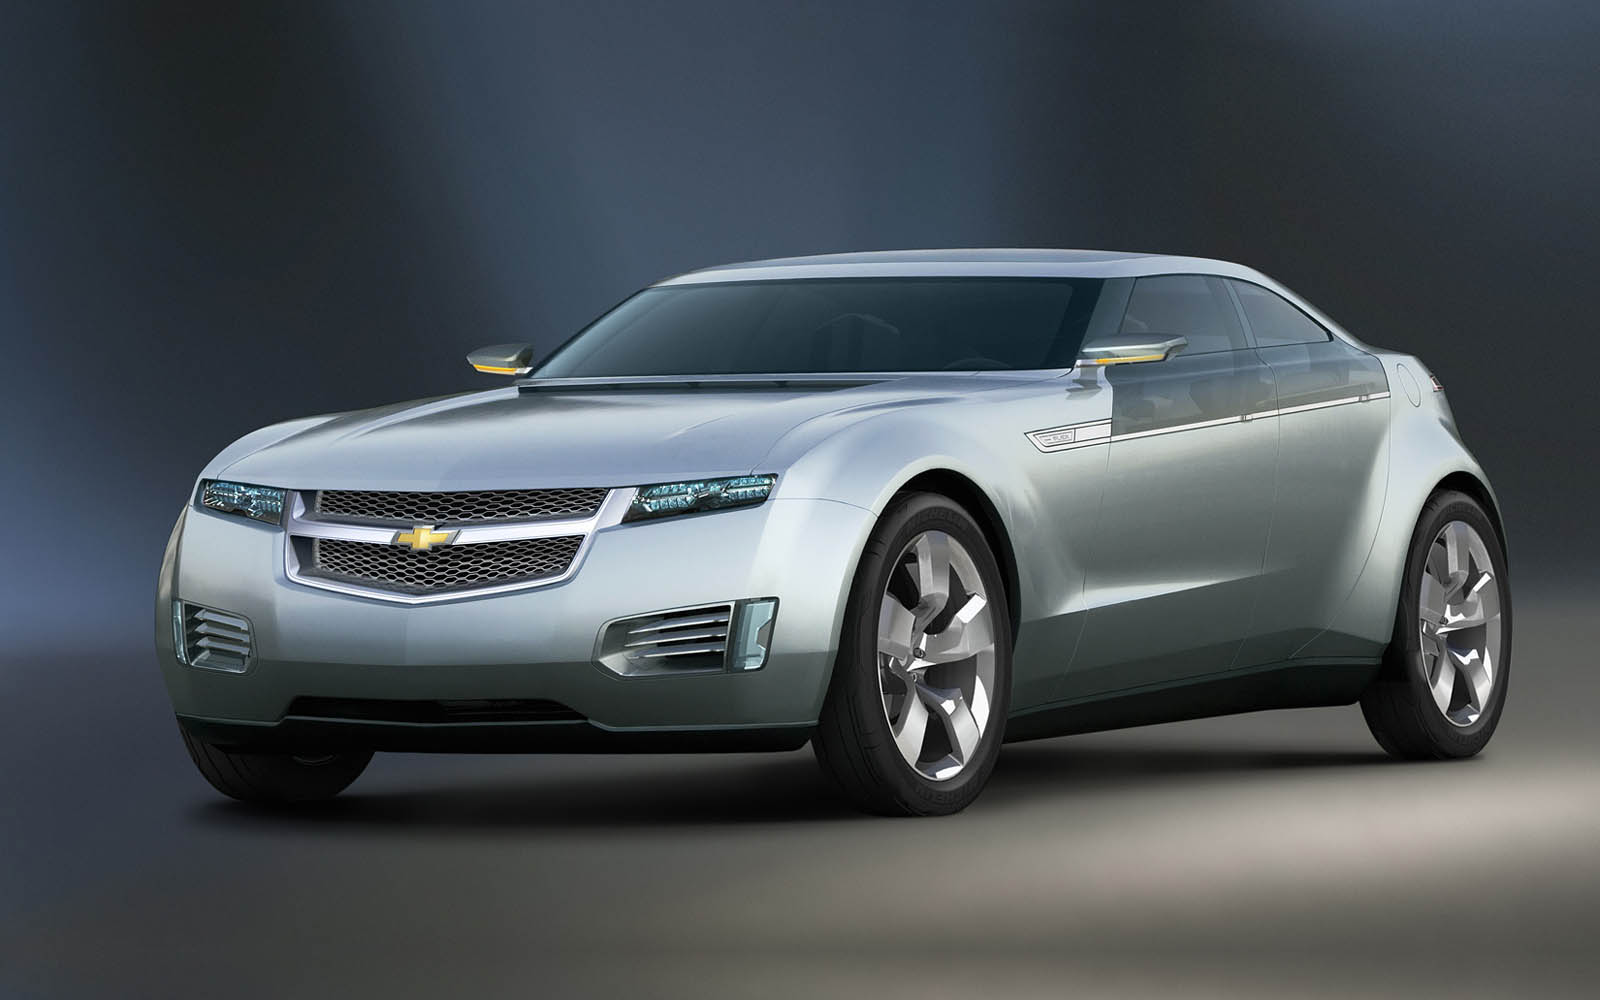 wallpaper: Chevrolet Volt Concept Car Paos